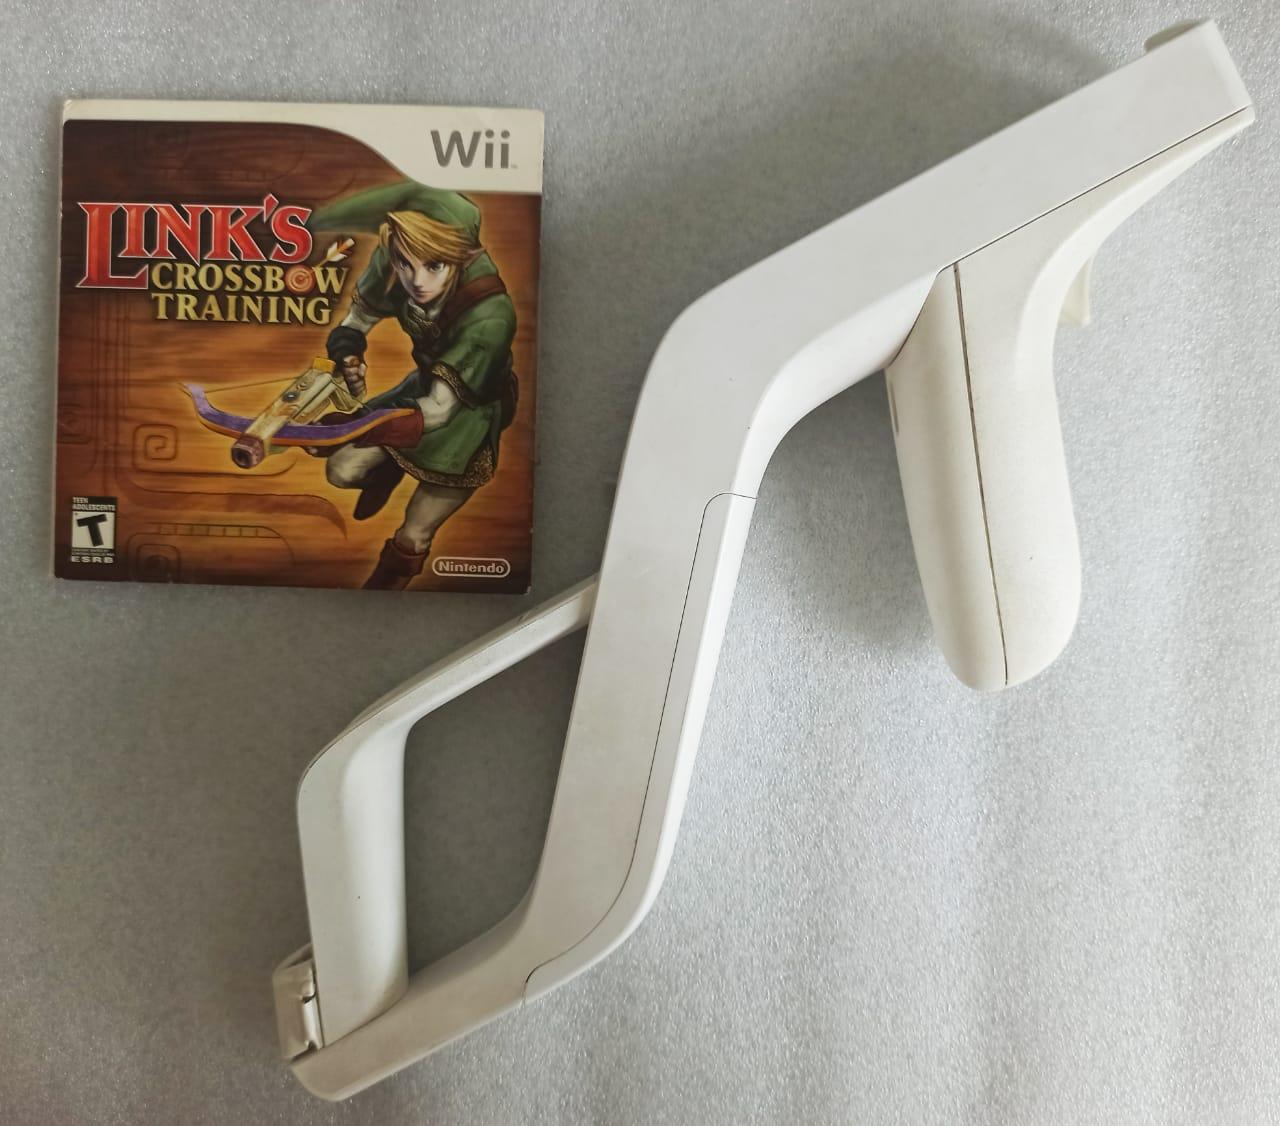 Link's Crossbow Training + Wii Zapper - USADO - Nintendo Wii